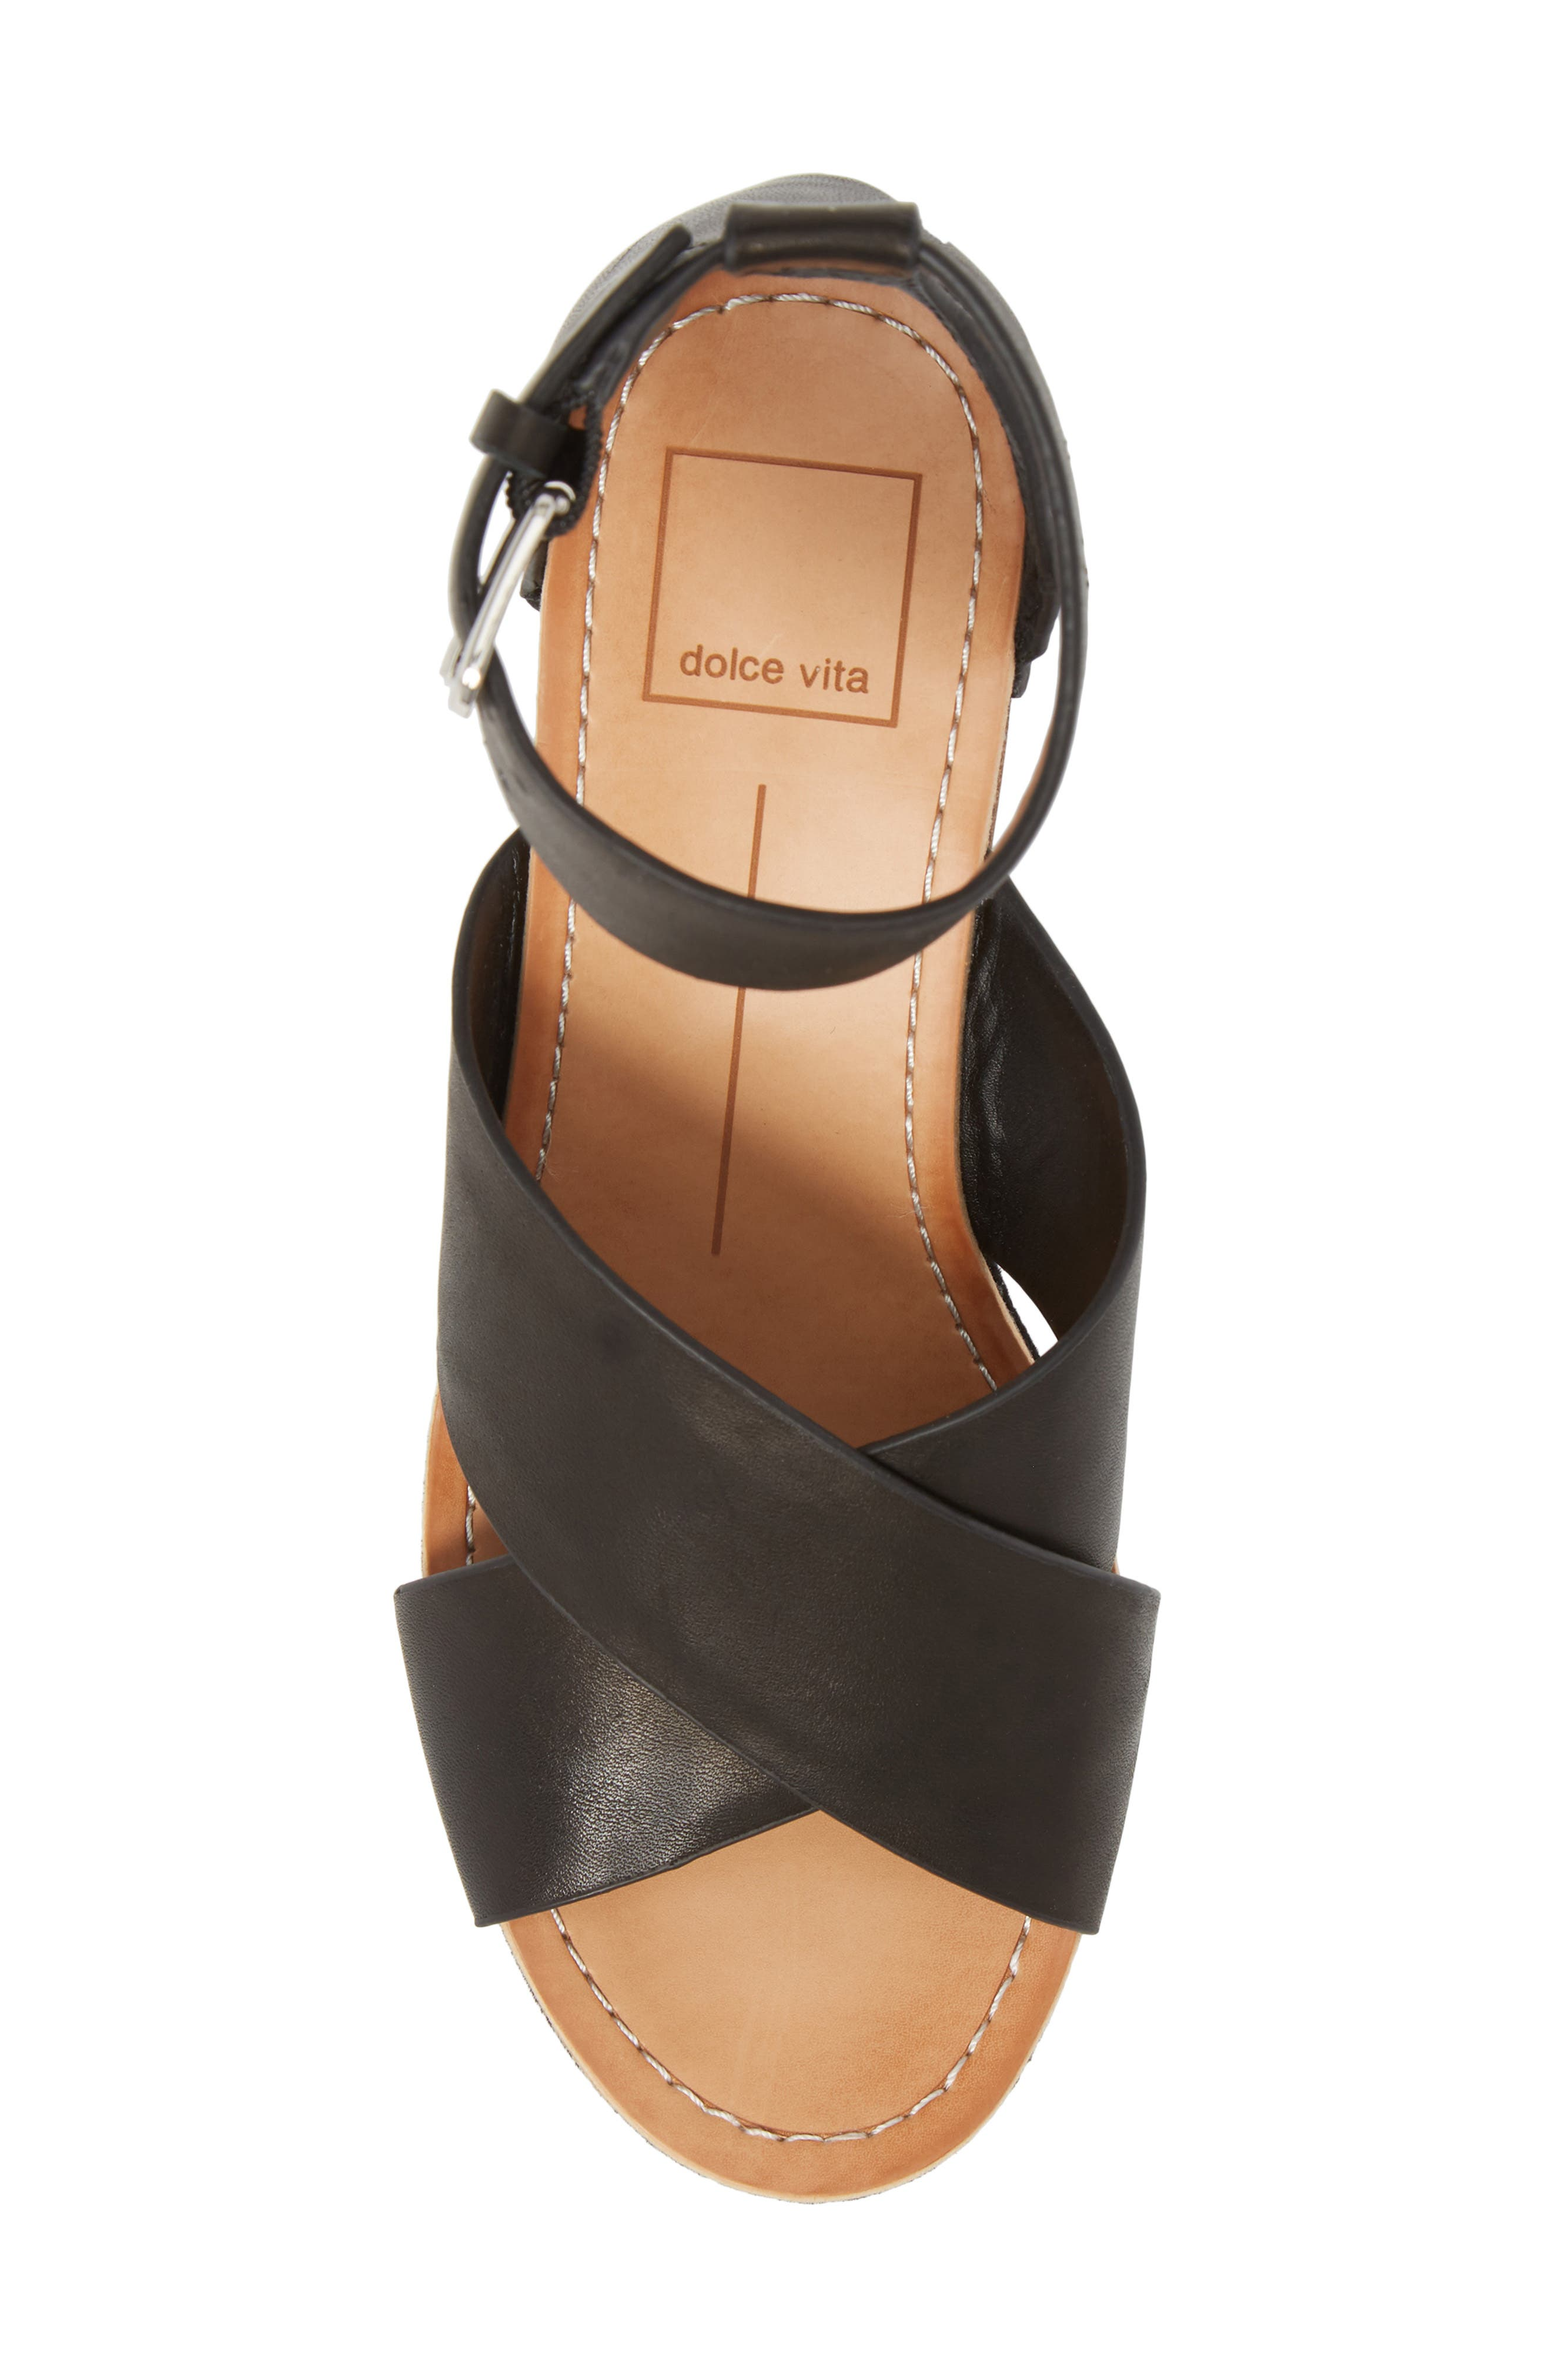 DOLCE VITA,                             Dalrae Platform Wedge Sandal,                             Alternate thumbnail 5, color,                             001